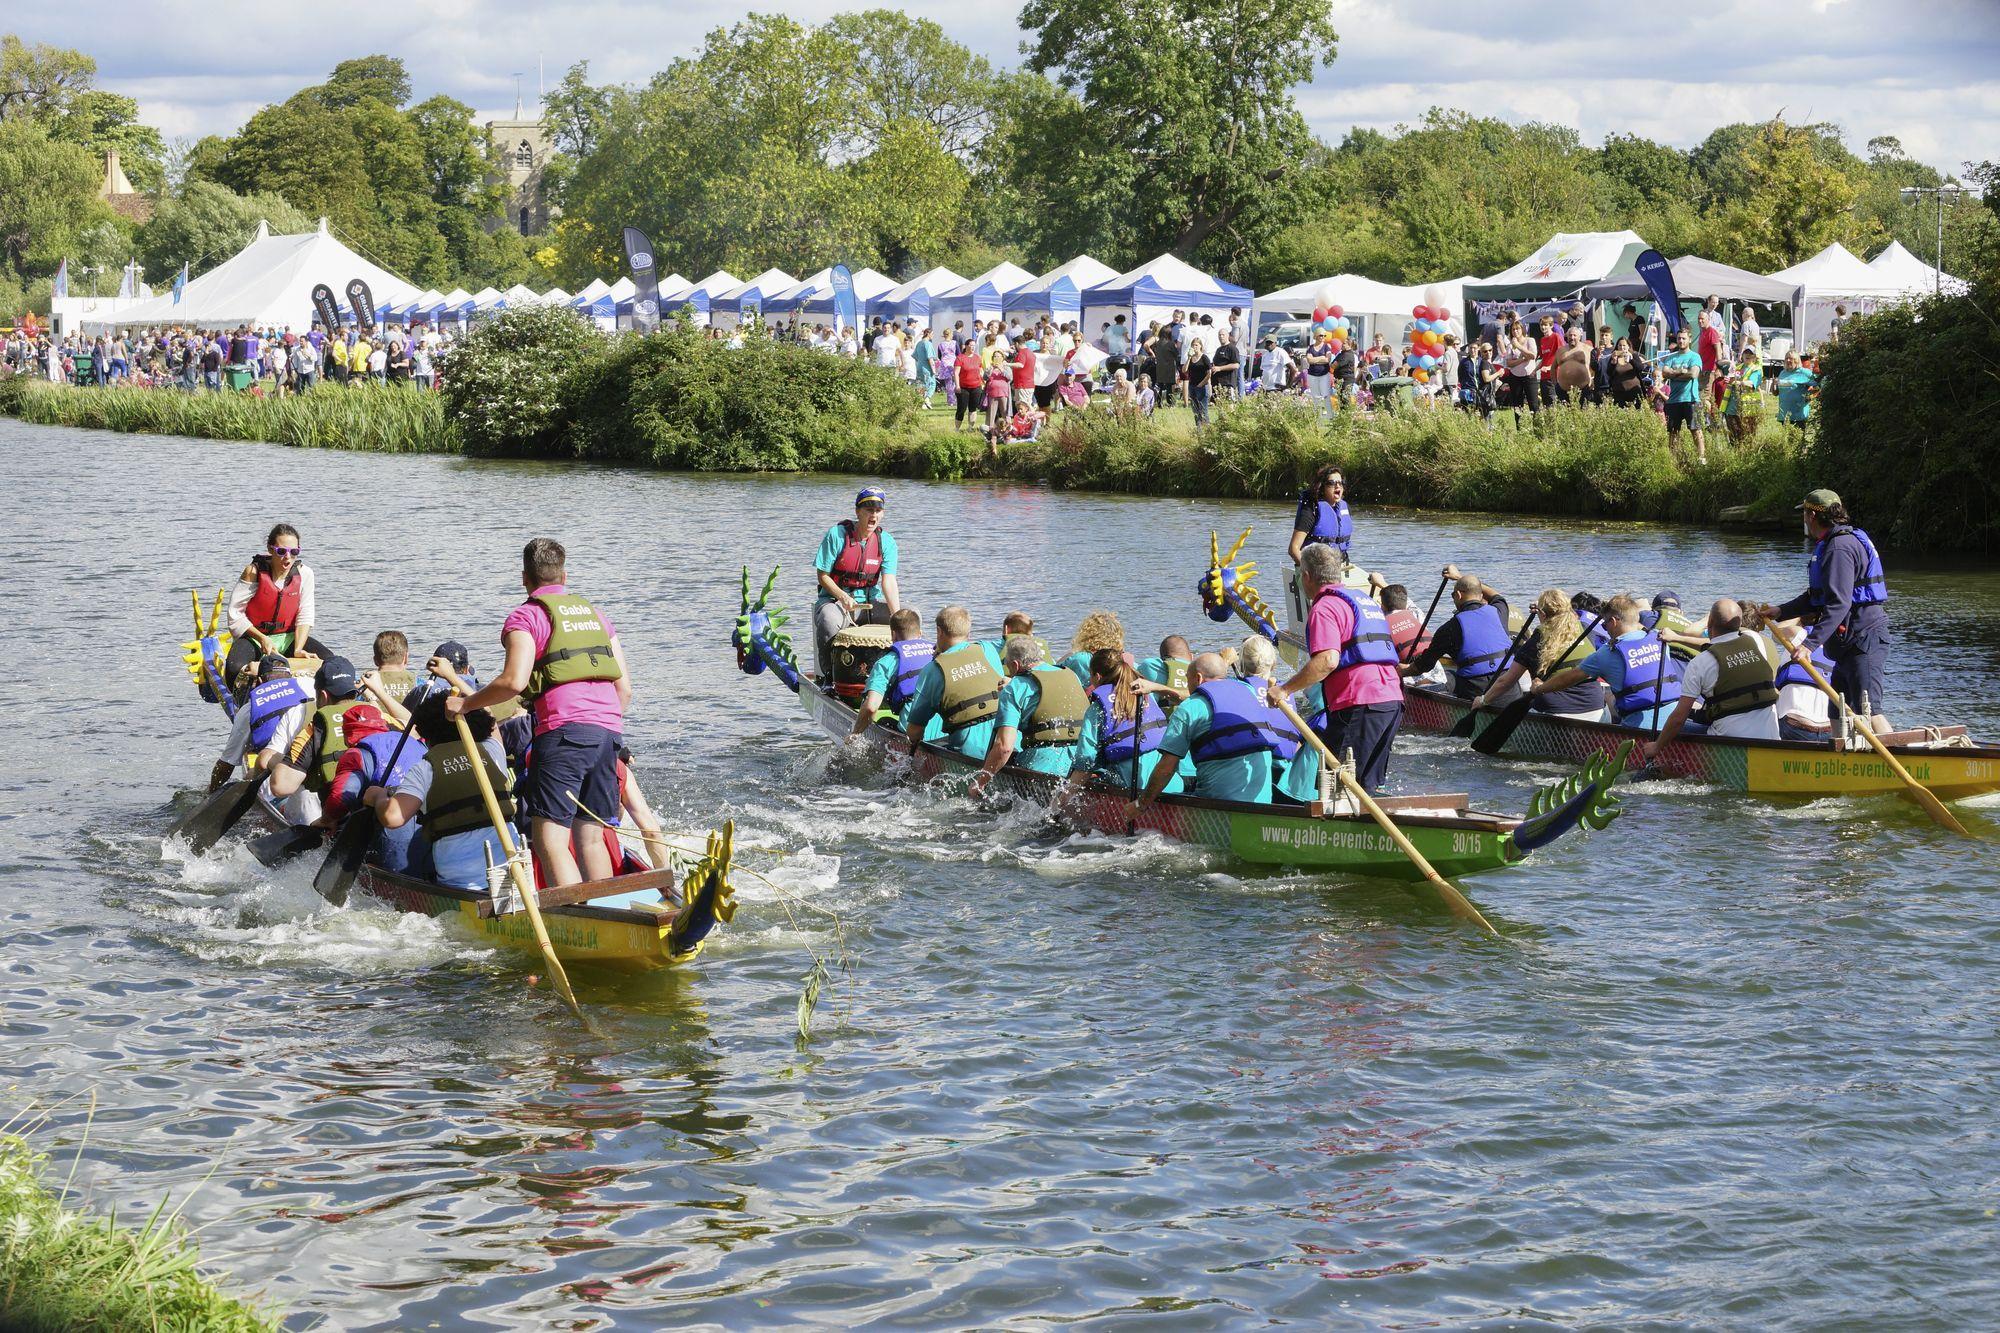 Citystay Dragonboat Festival